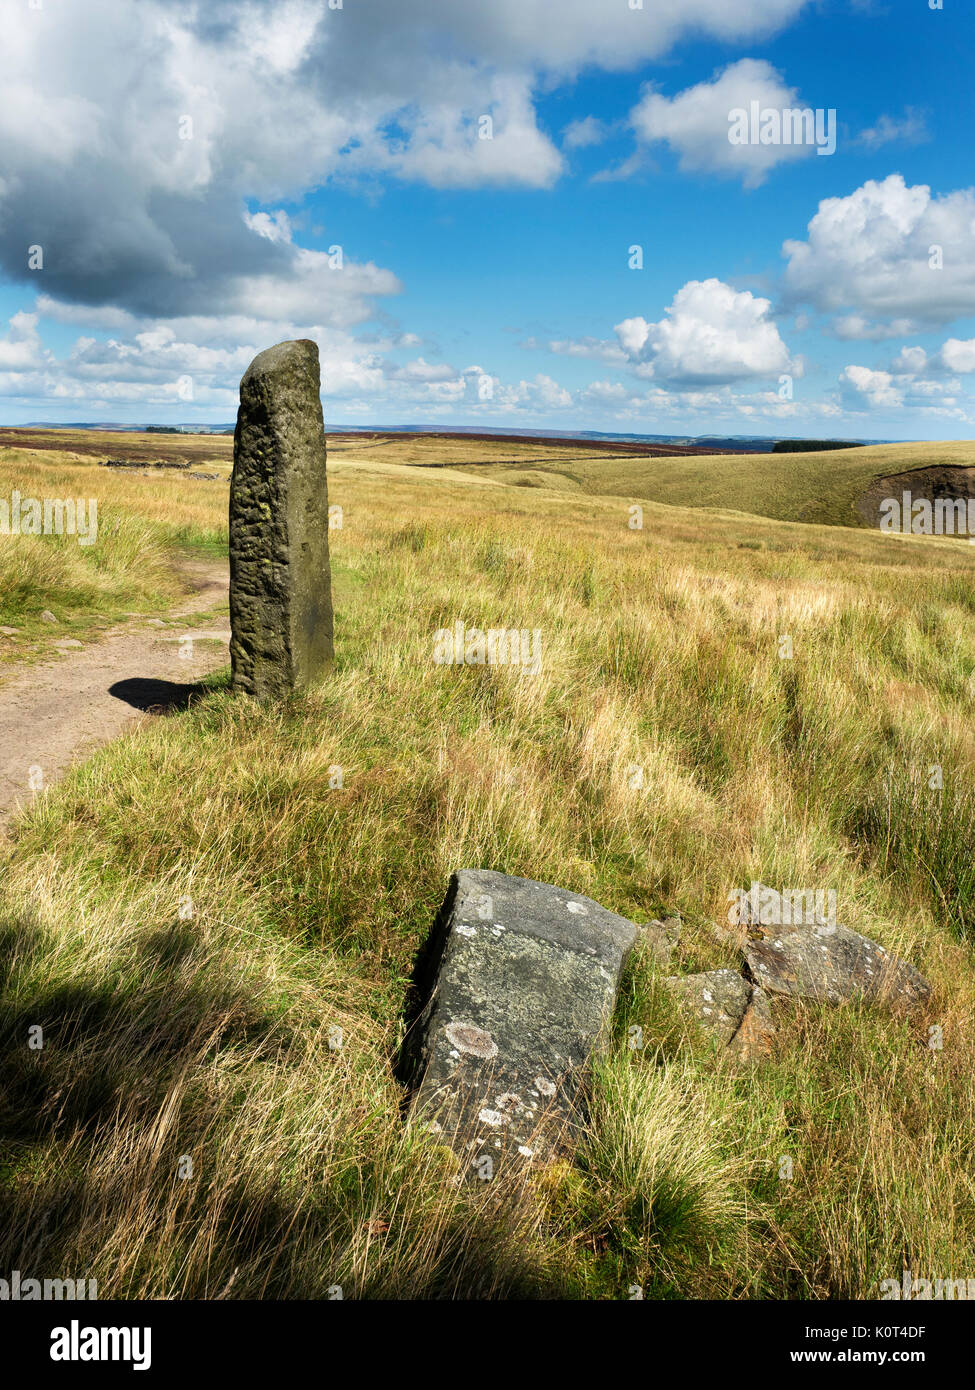 Old Gatepost on the Pennine Way near Haworth West Yorkshire England - Stock Image